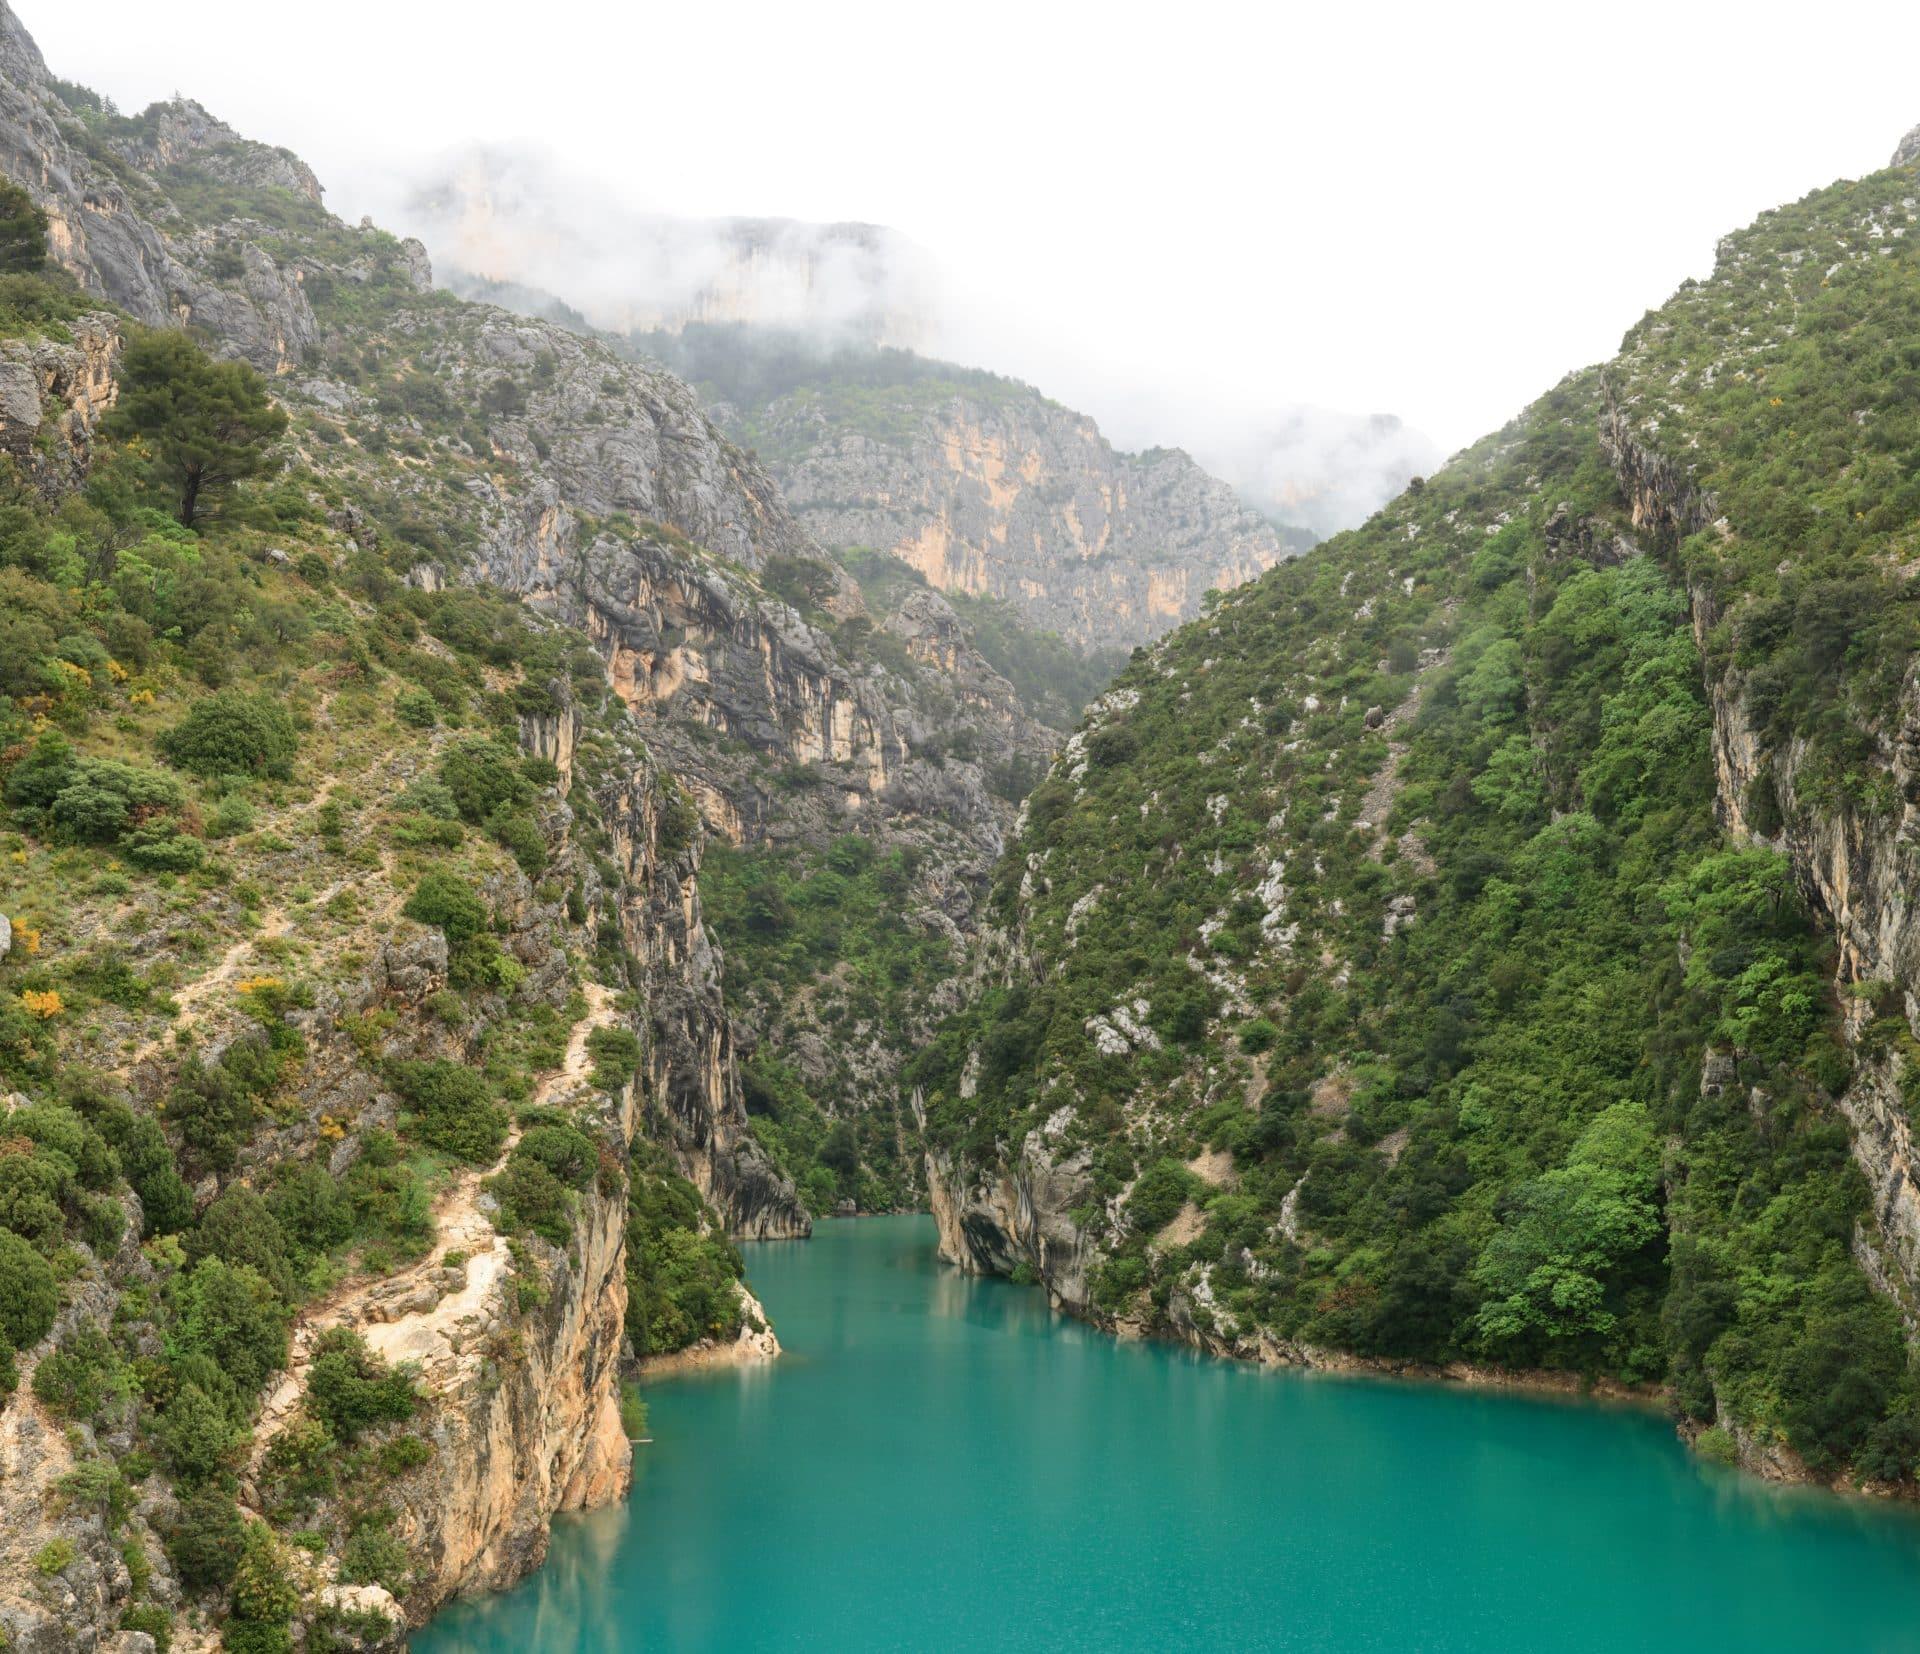 Martel Verdon Gorge hiking day, in Provence